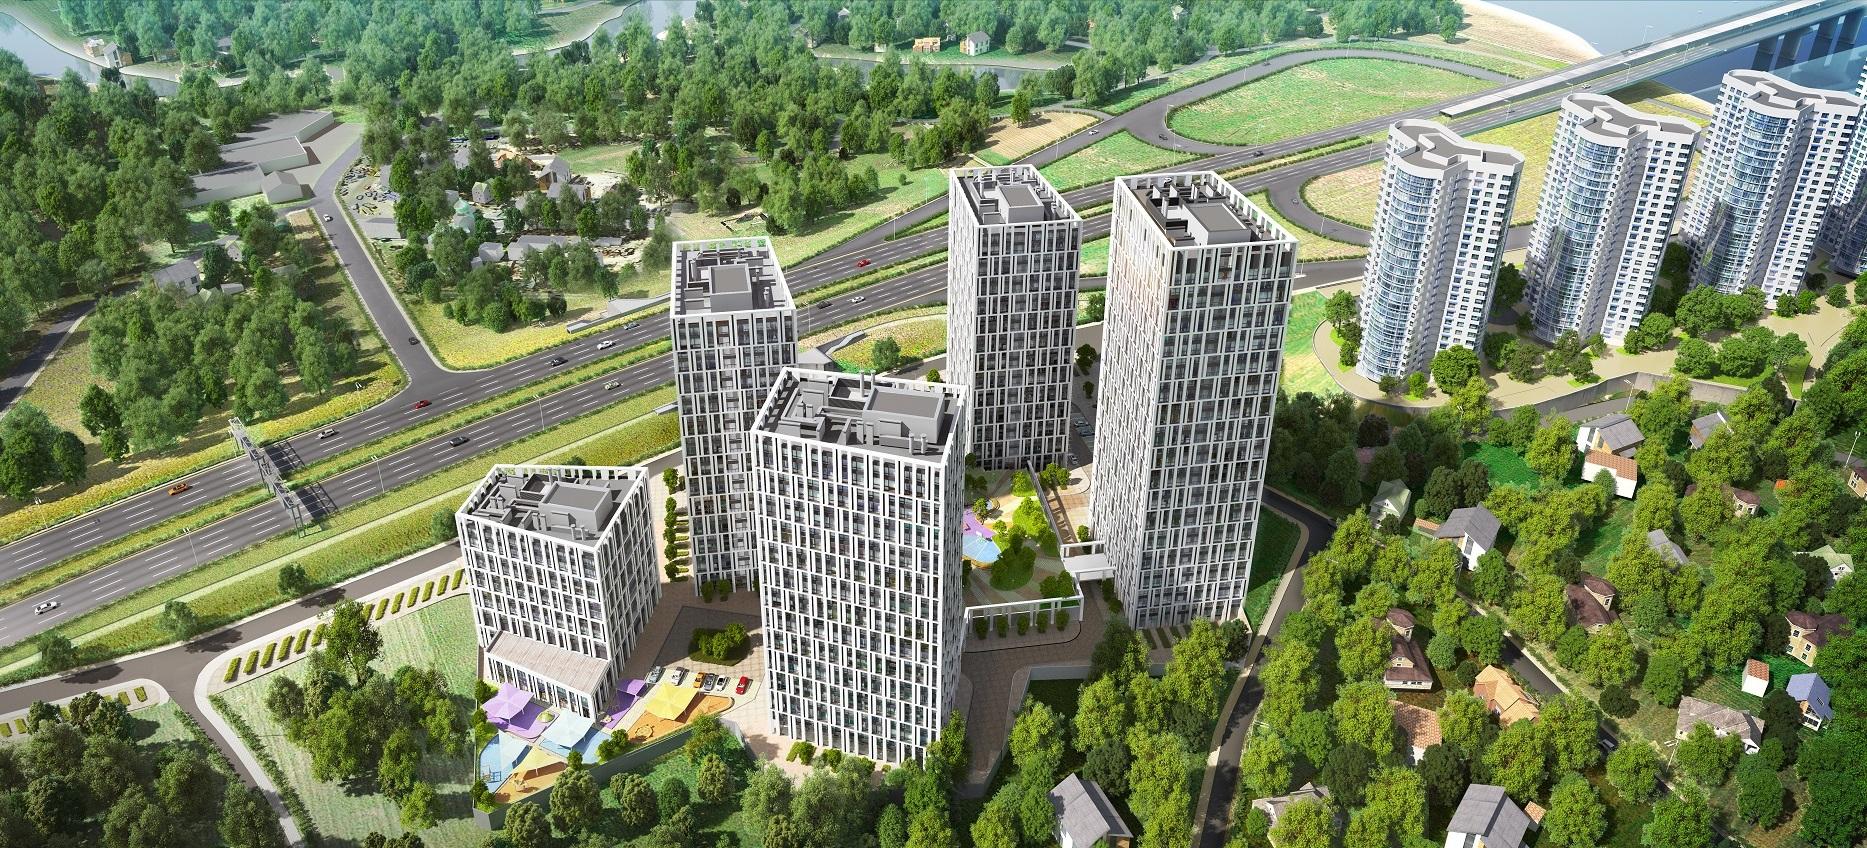 Жилой комплекс Славутич_панорама 2